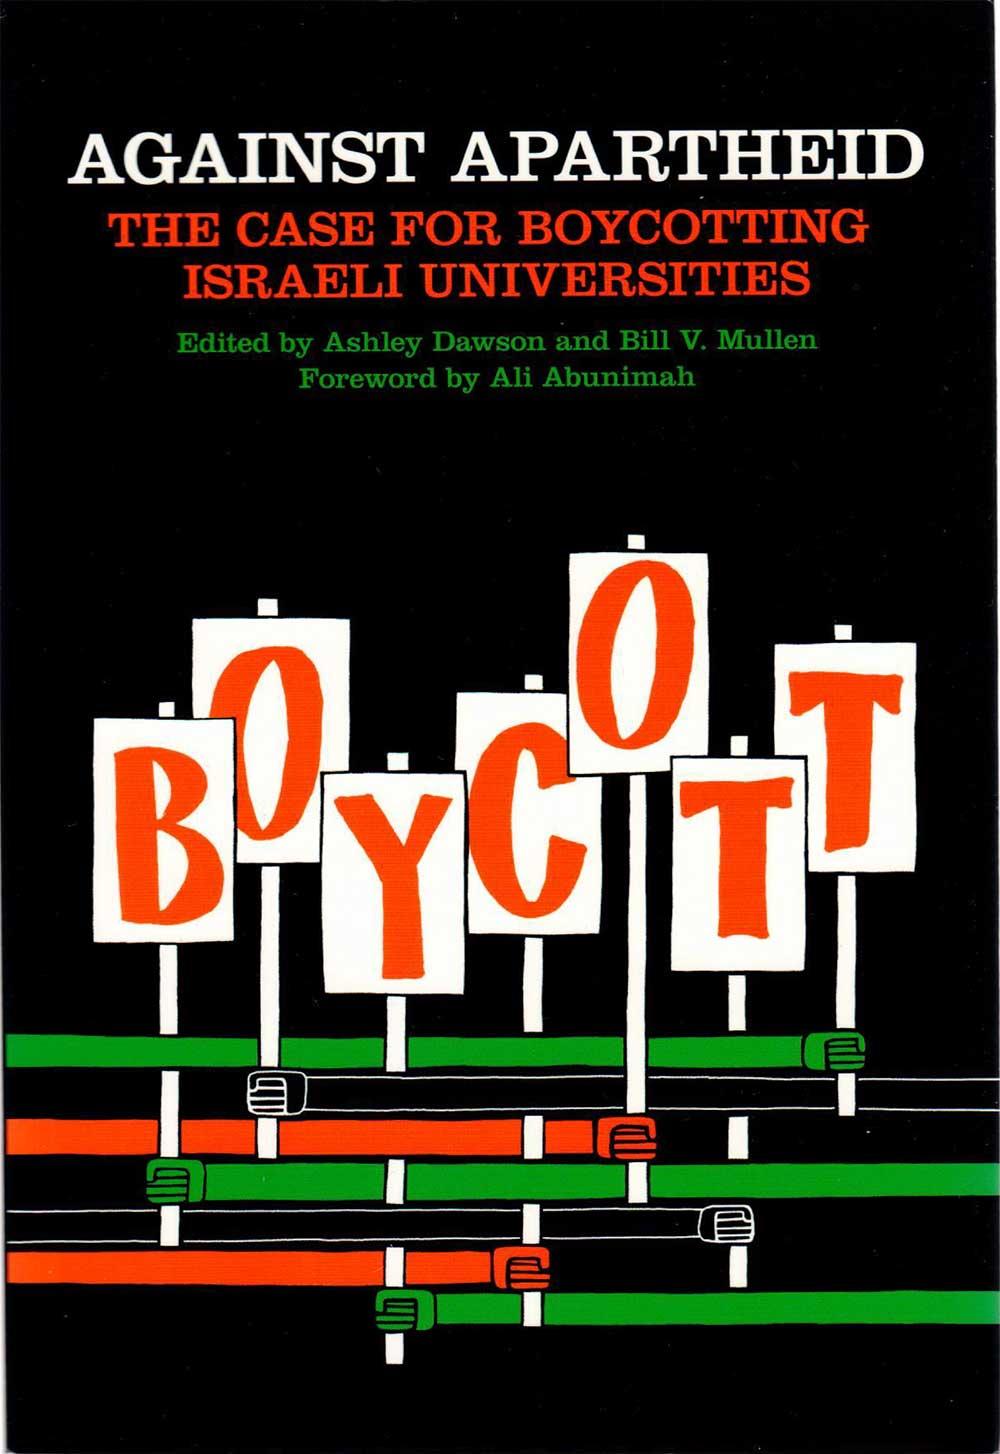 mullen-book-cover8-against-apartheid-1000px (1).jpg